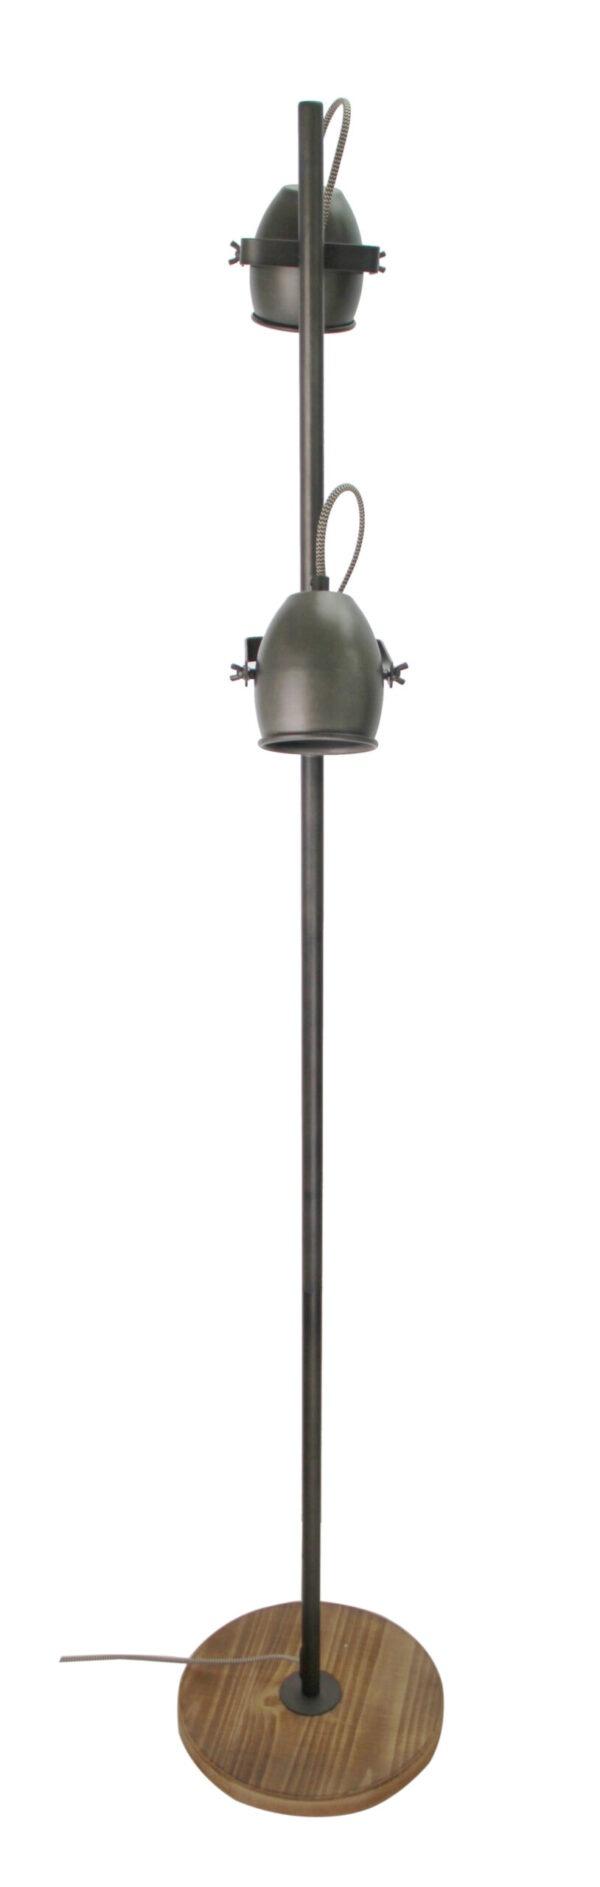 Dolce staande lamp - 2 lichts - zwart black steel met vintage hout